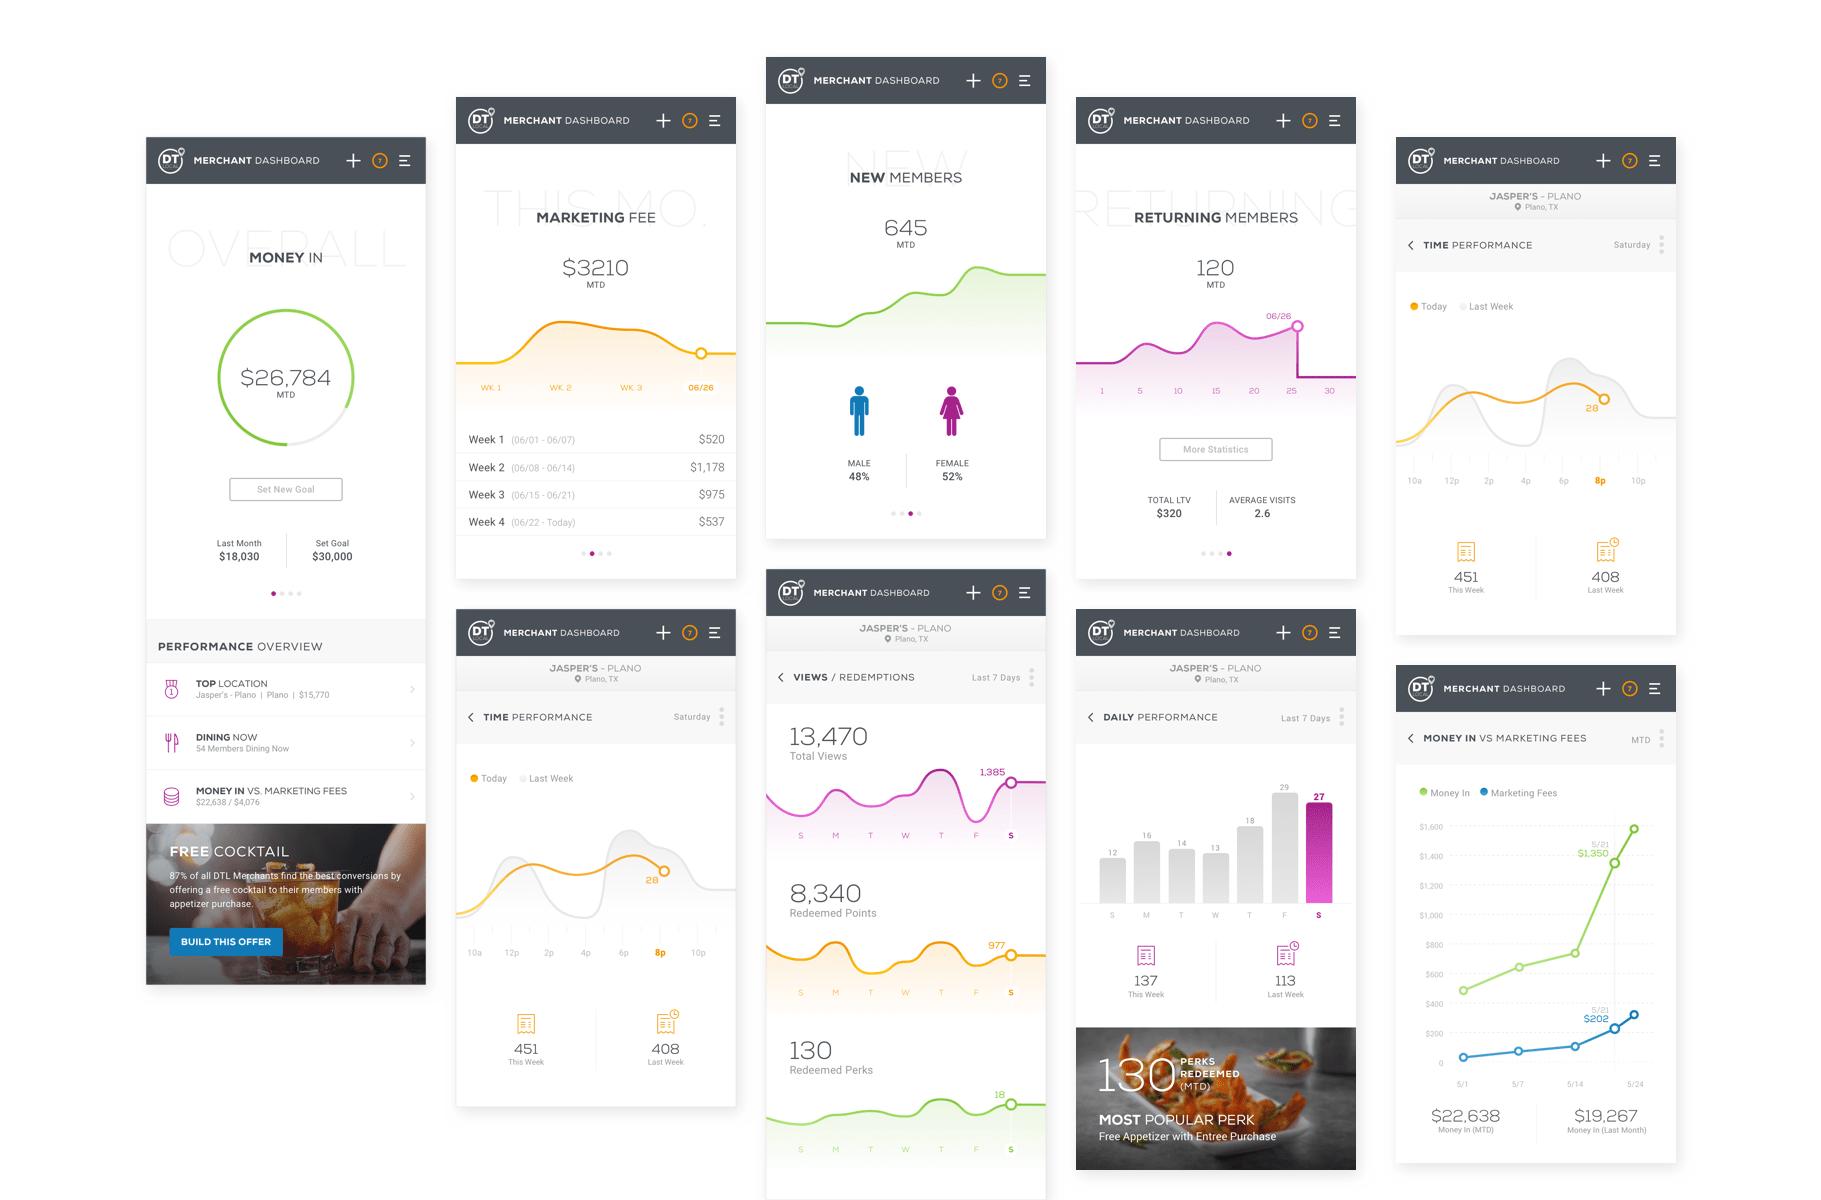 Dtl merch app stats img